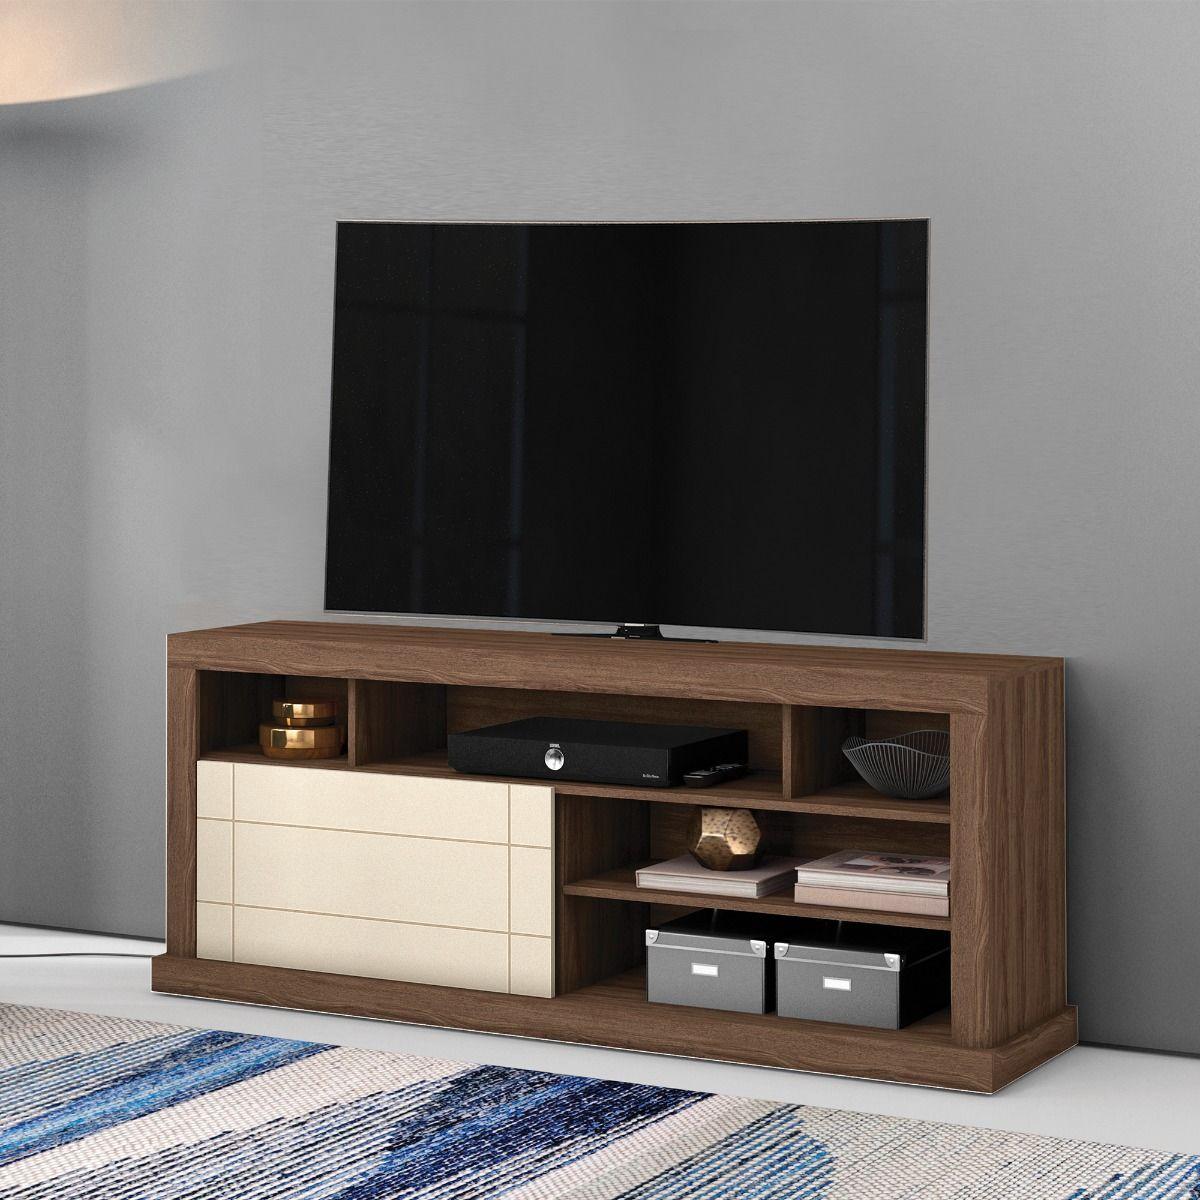 Mueble para tv para salas peque as for Mueble de entretenimiento para sala